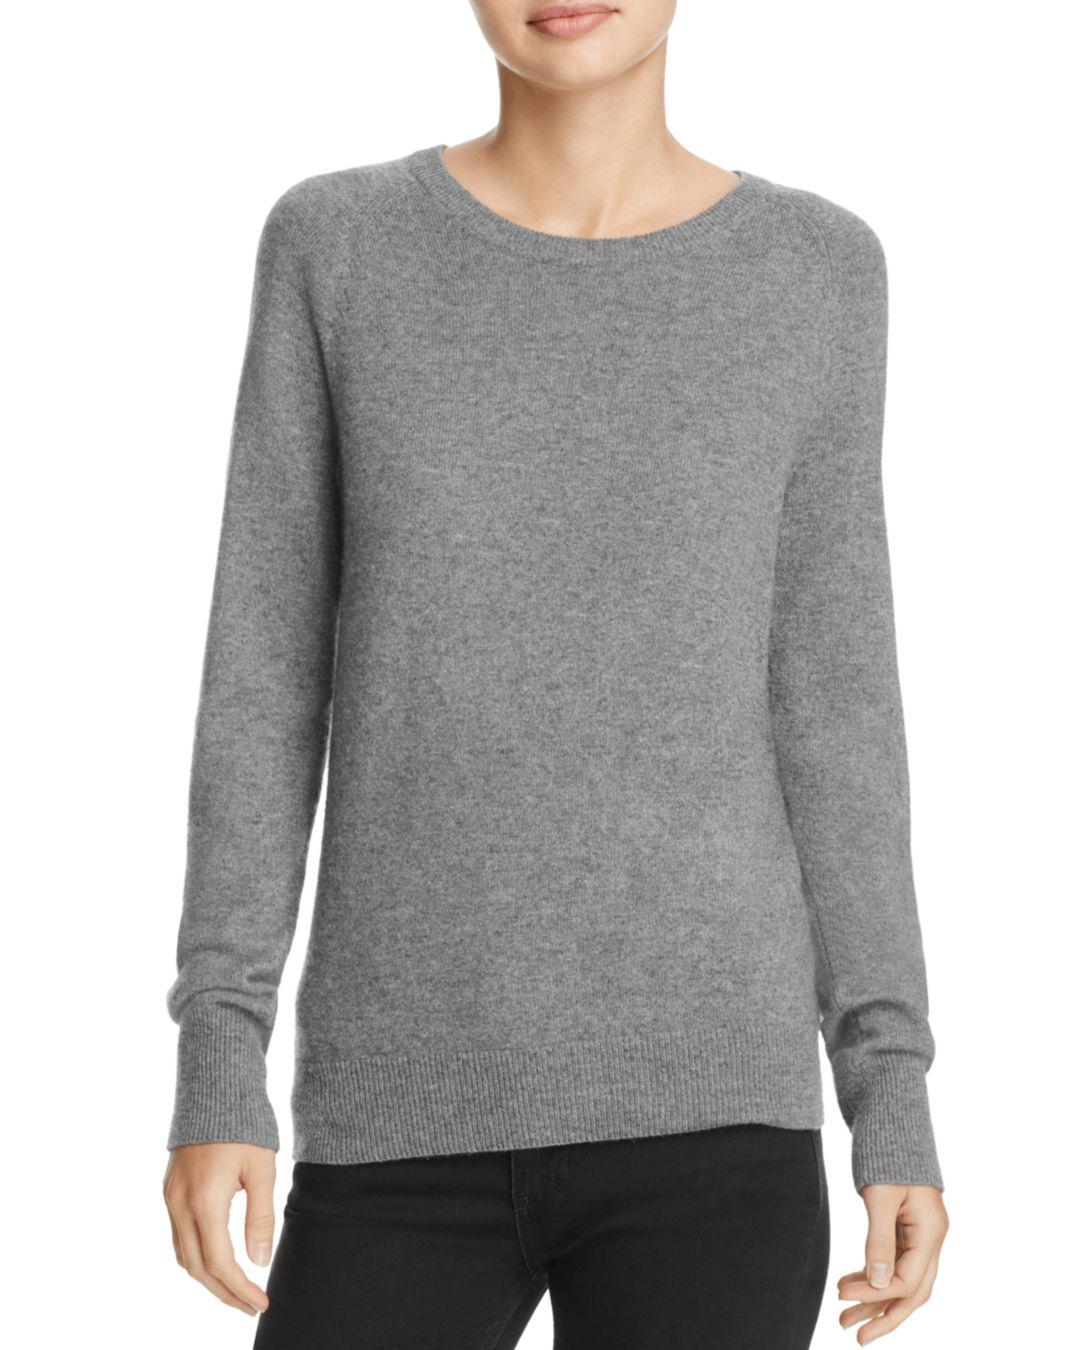 Equipment Sloane Cashmere Sweater in Heather Gray (Grey)